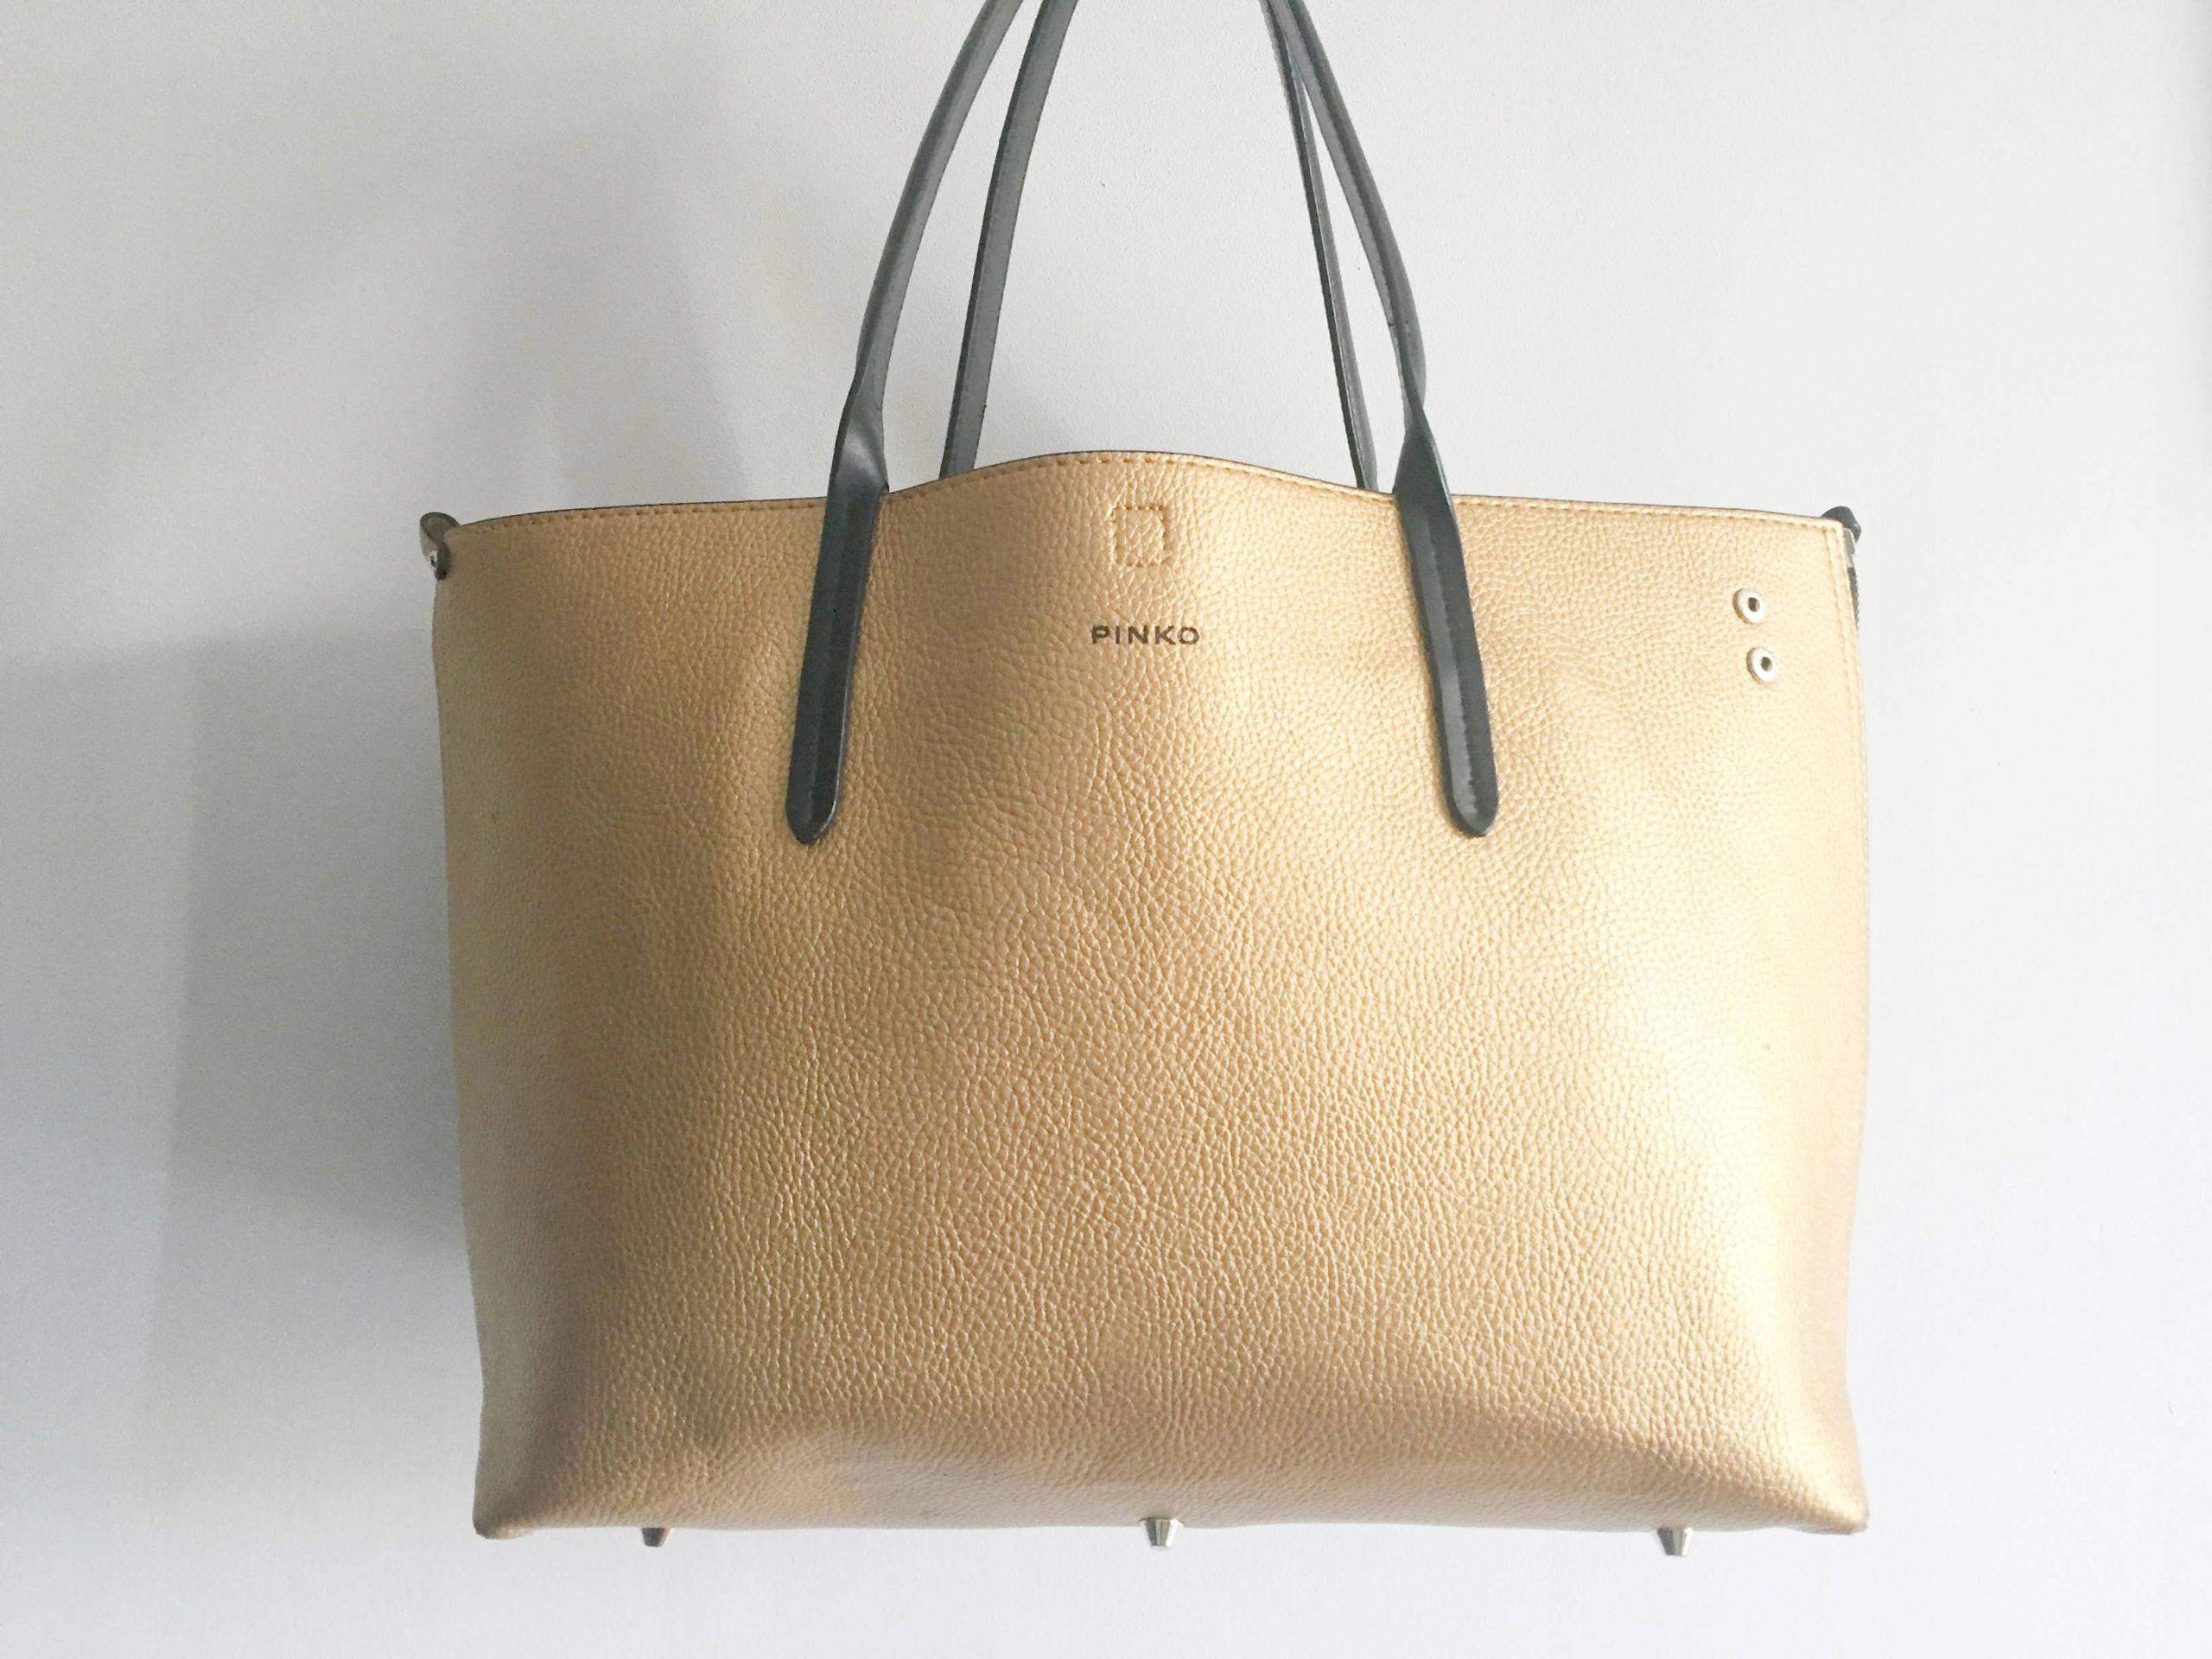 cfdd3ce058c6d PINKO oryginalna torebka torba shopper od 1 zł! - 7702155645 ...